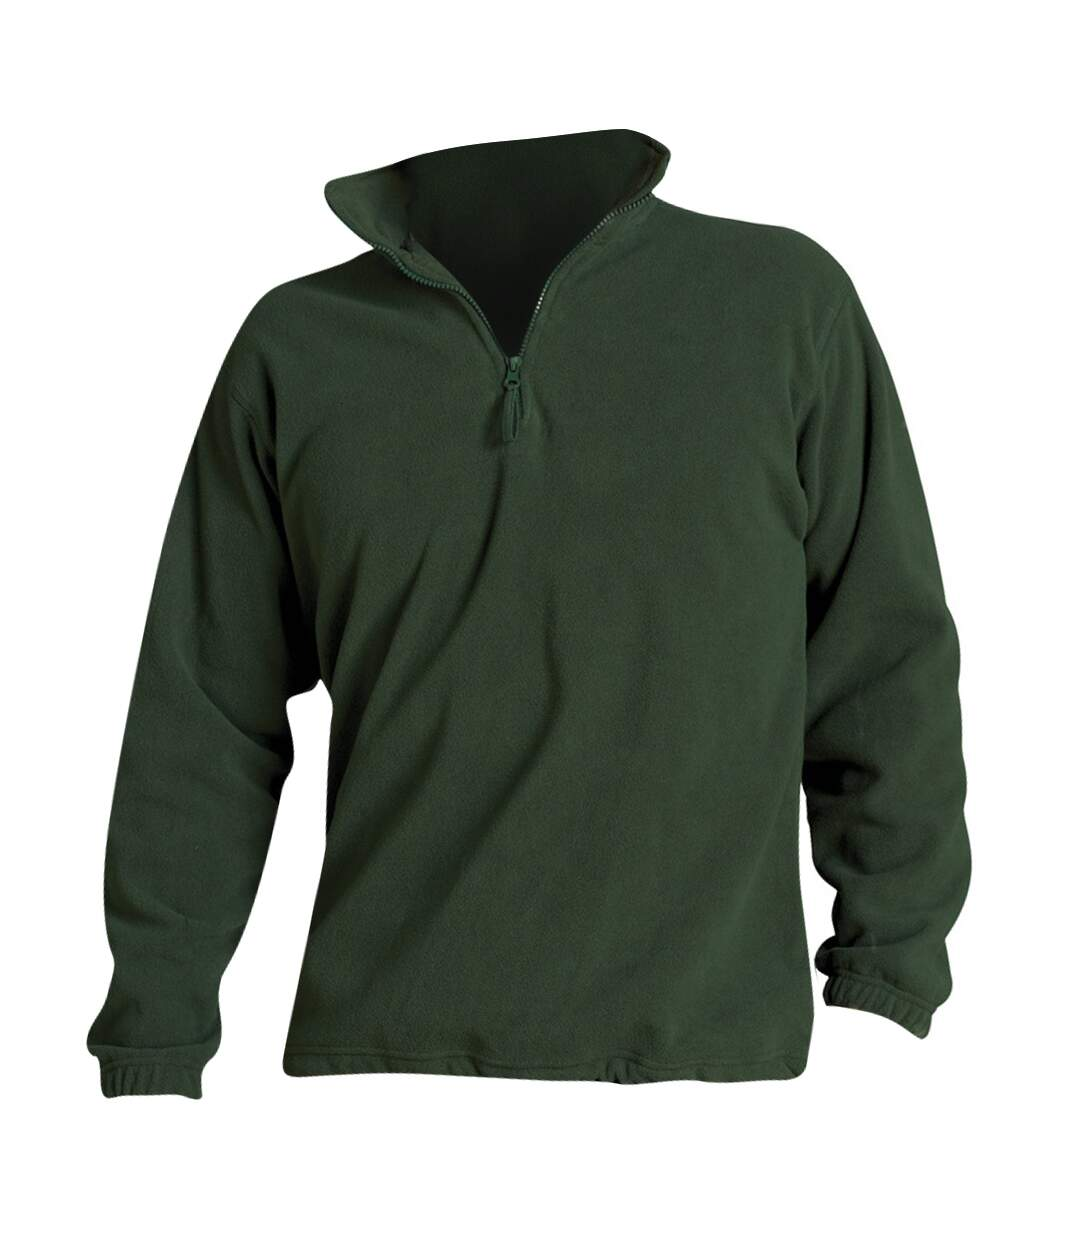 SOLS Ness Unisex Zip Neck Anti-Pill Fleece Top (Forest Green) - UTPC345